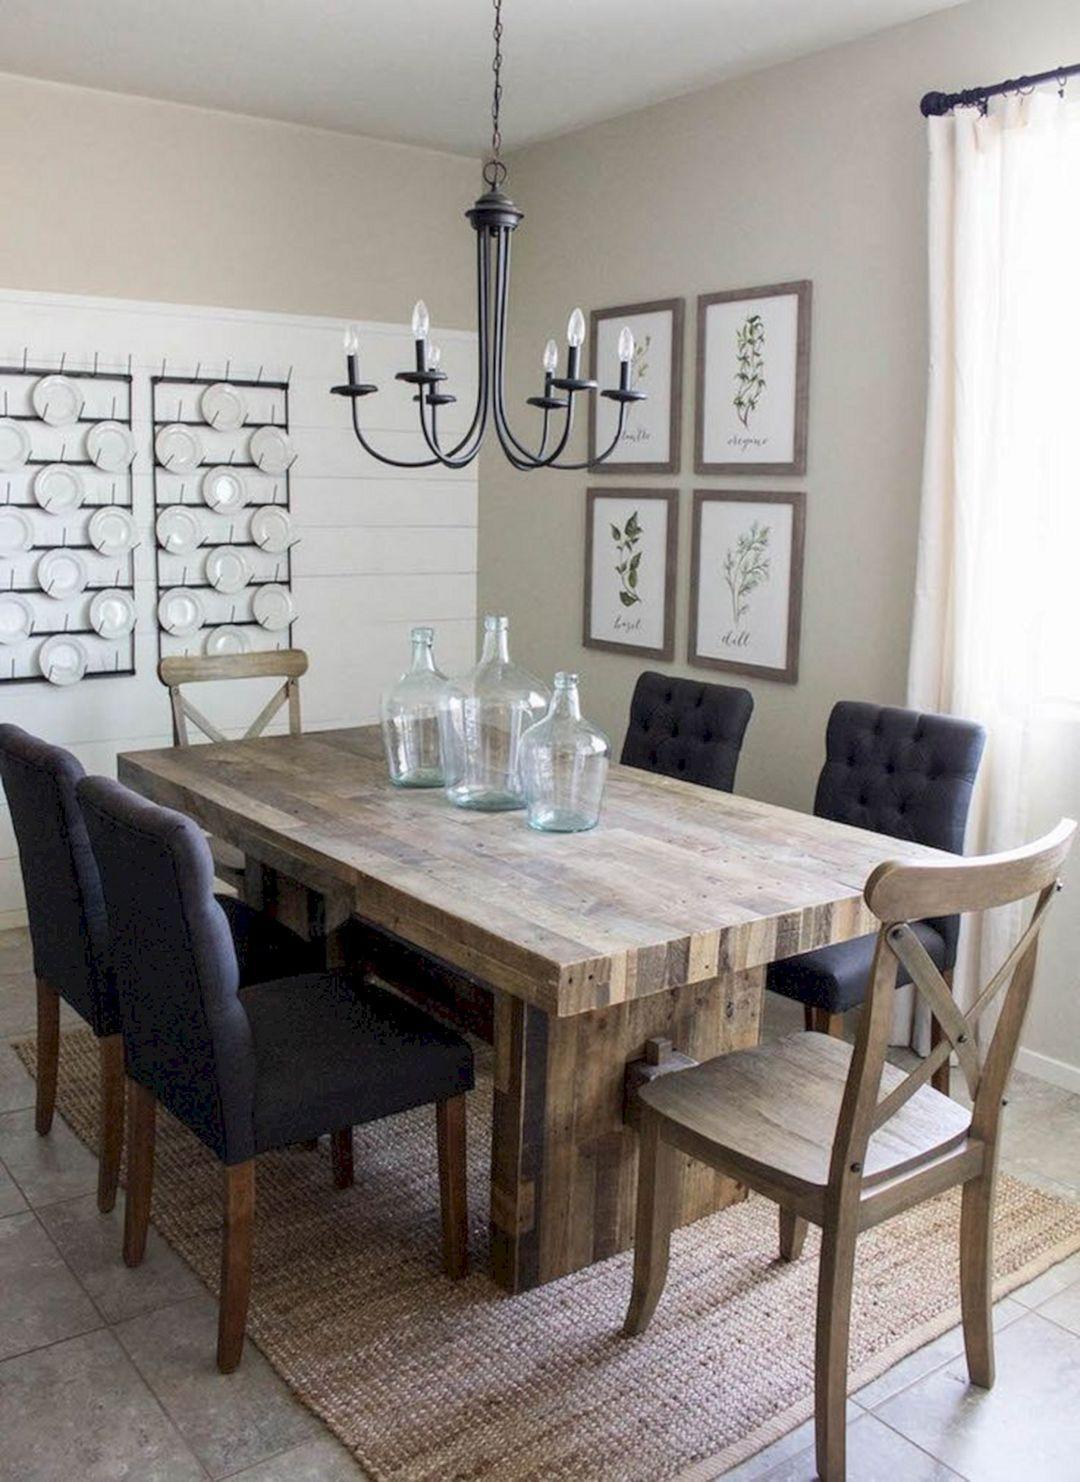 20 awesome farmhouse dining room design and decor ideas furniture rh pinterest com